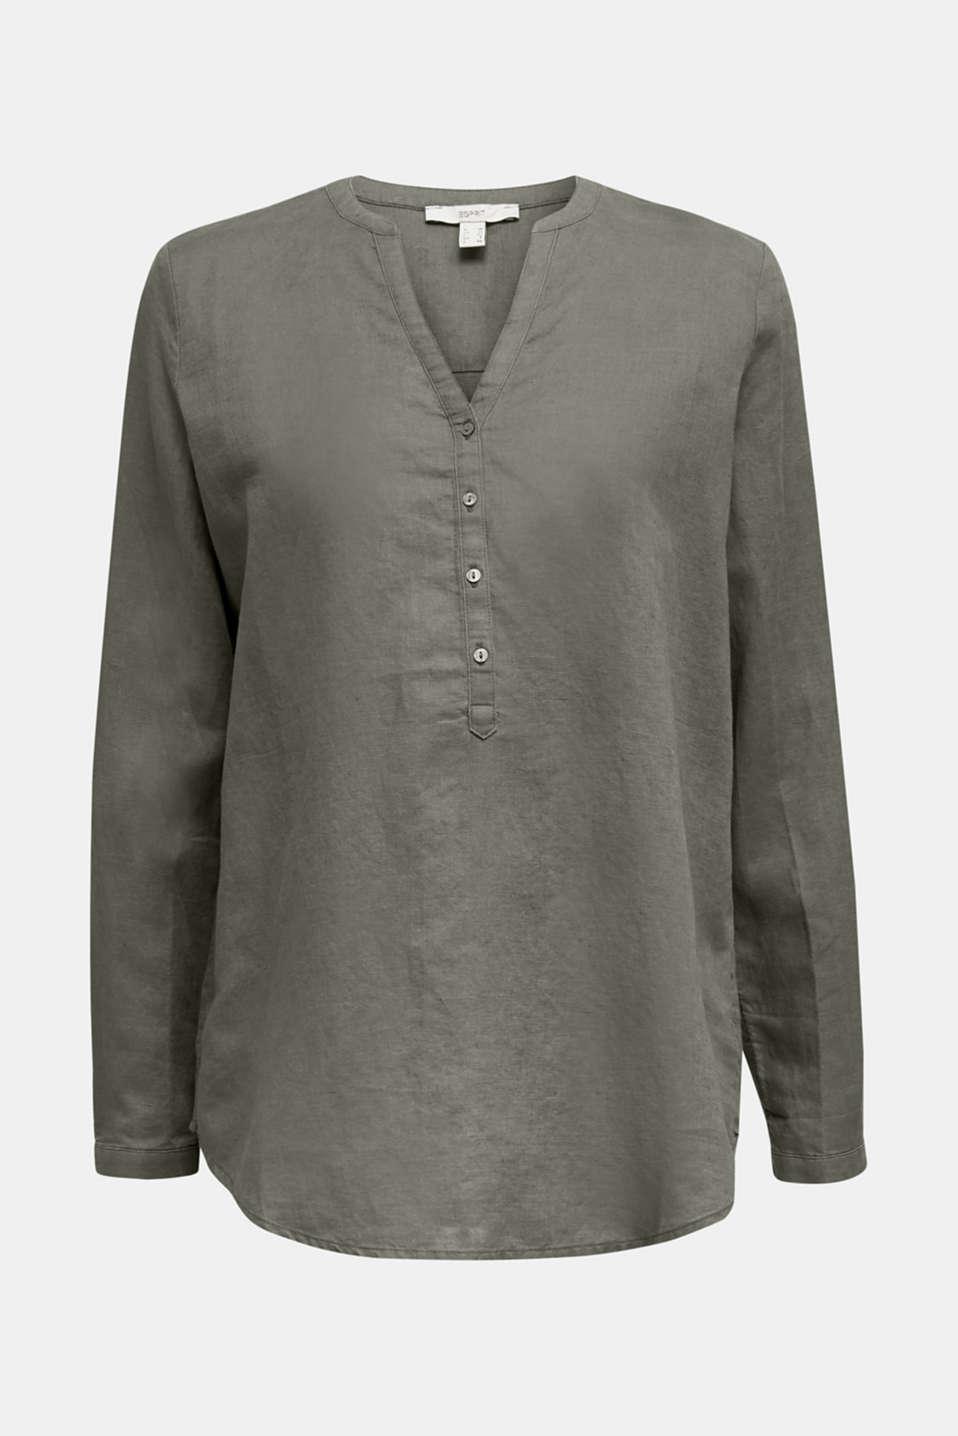 Turn-up blouse in blended linen, KHAKI GREEN, detail image number 7